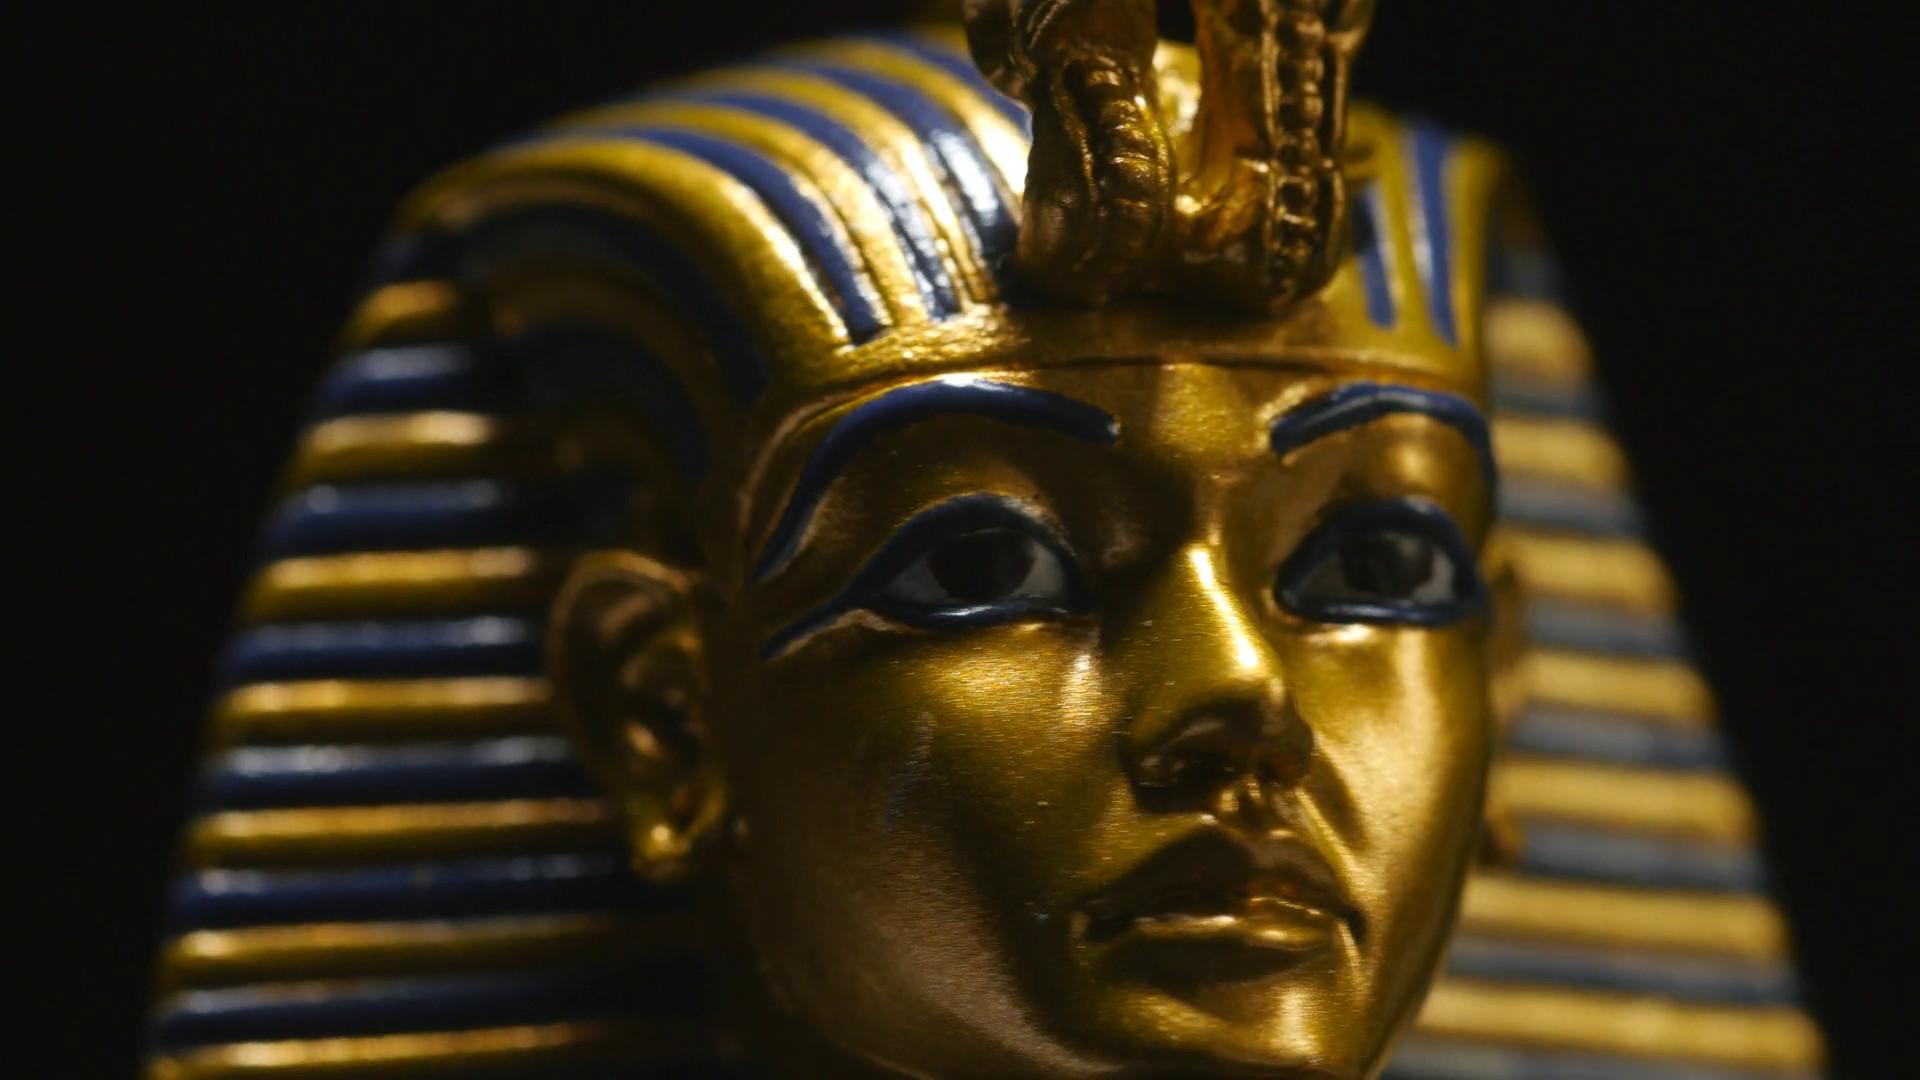 Oasis Wallpaper Iphone 5 Egyptian Pharaoh Wallpaper 56 Images